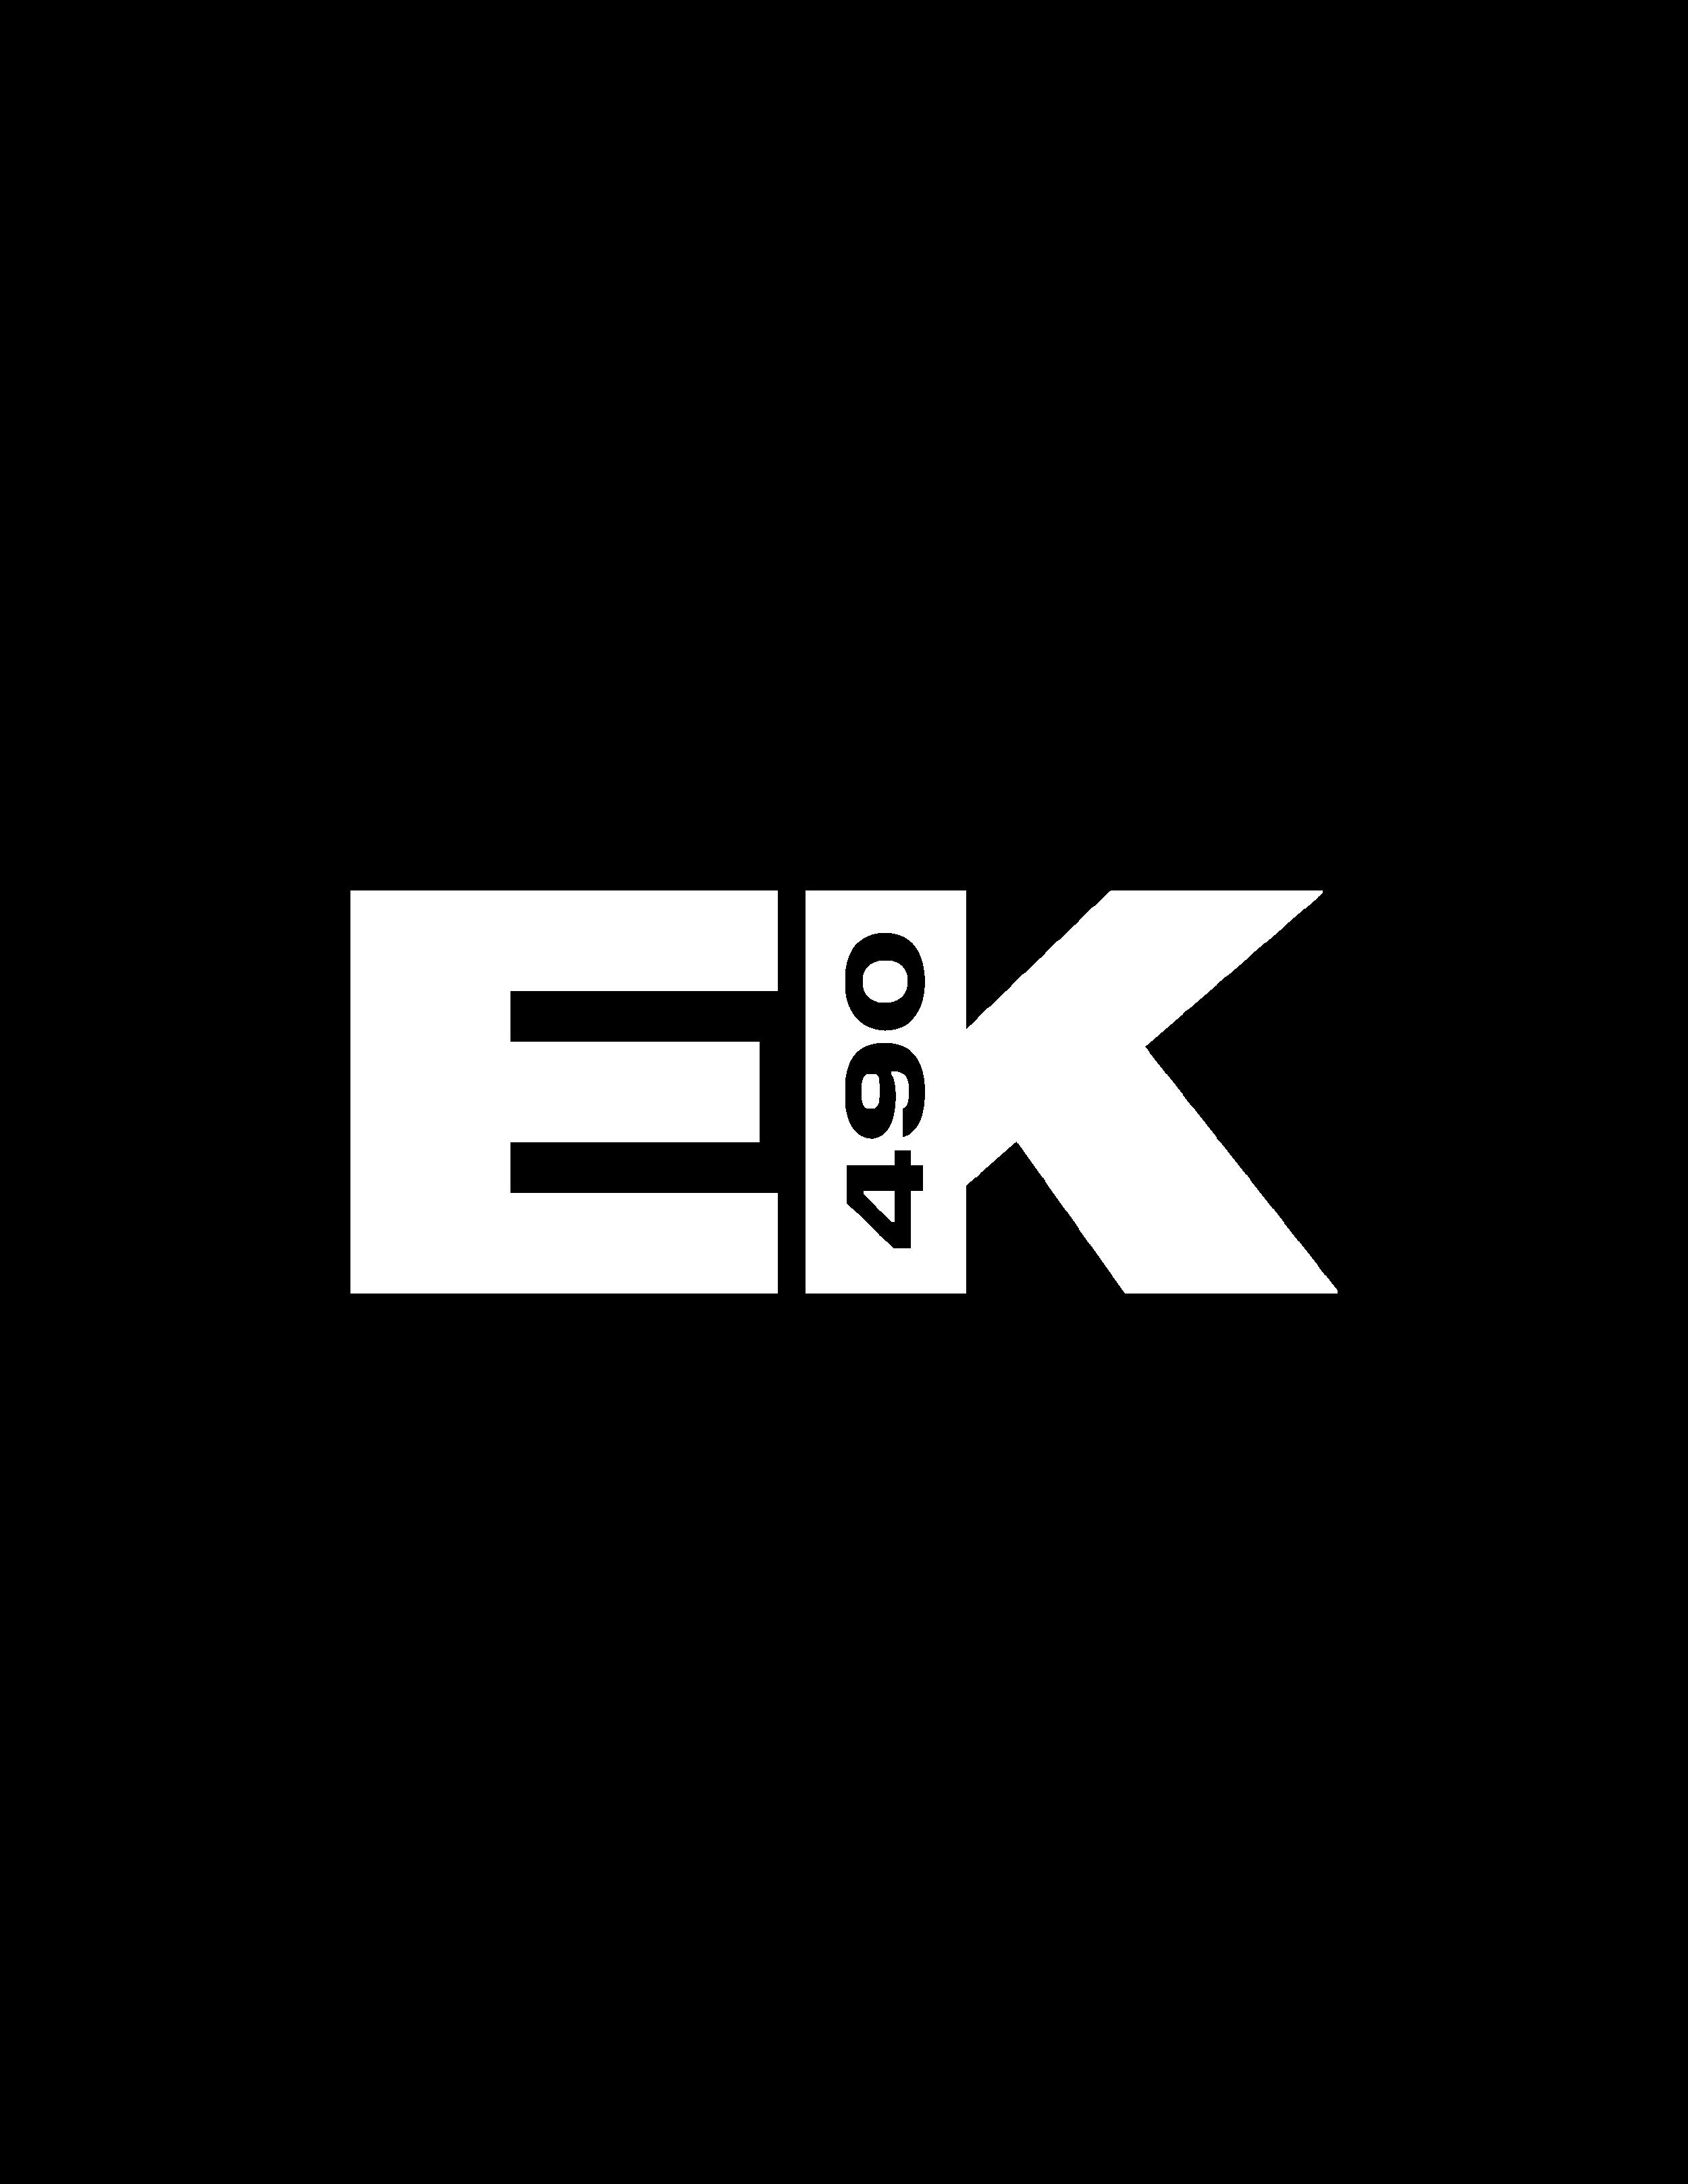 EK490